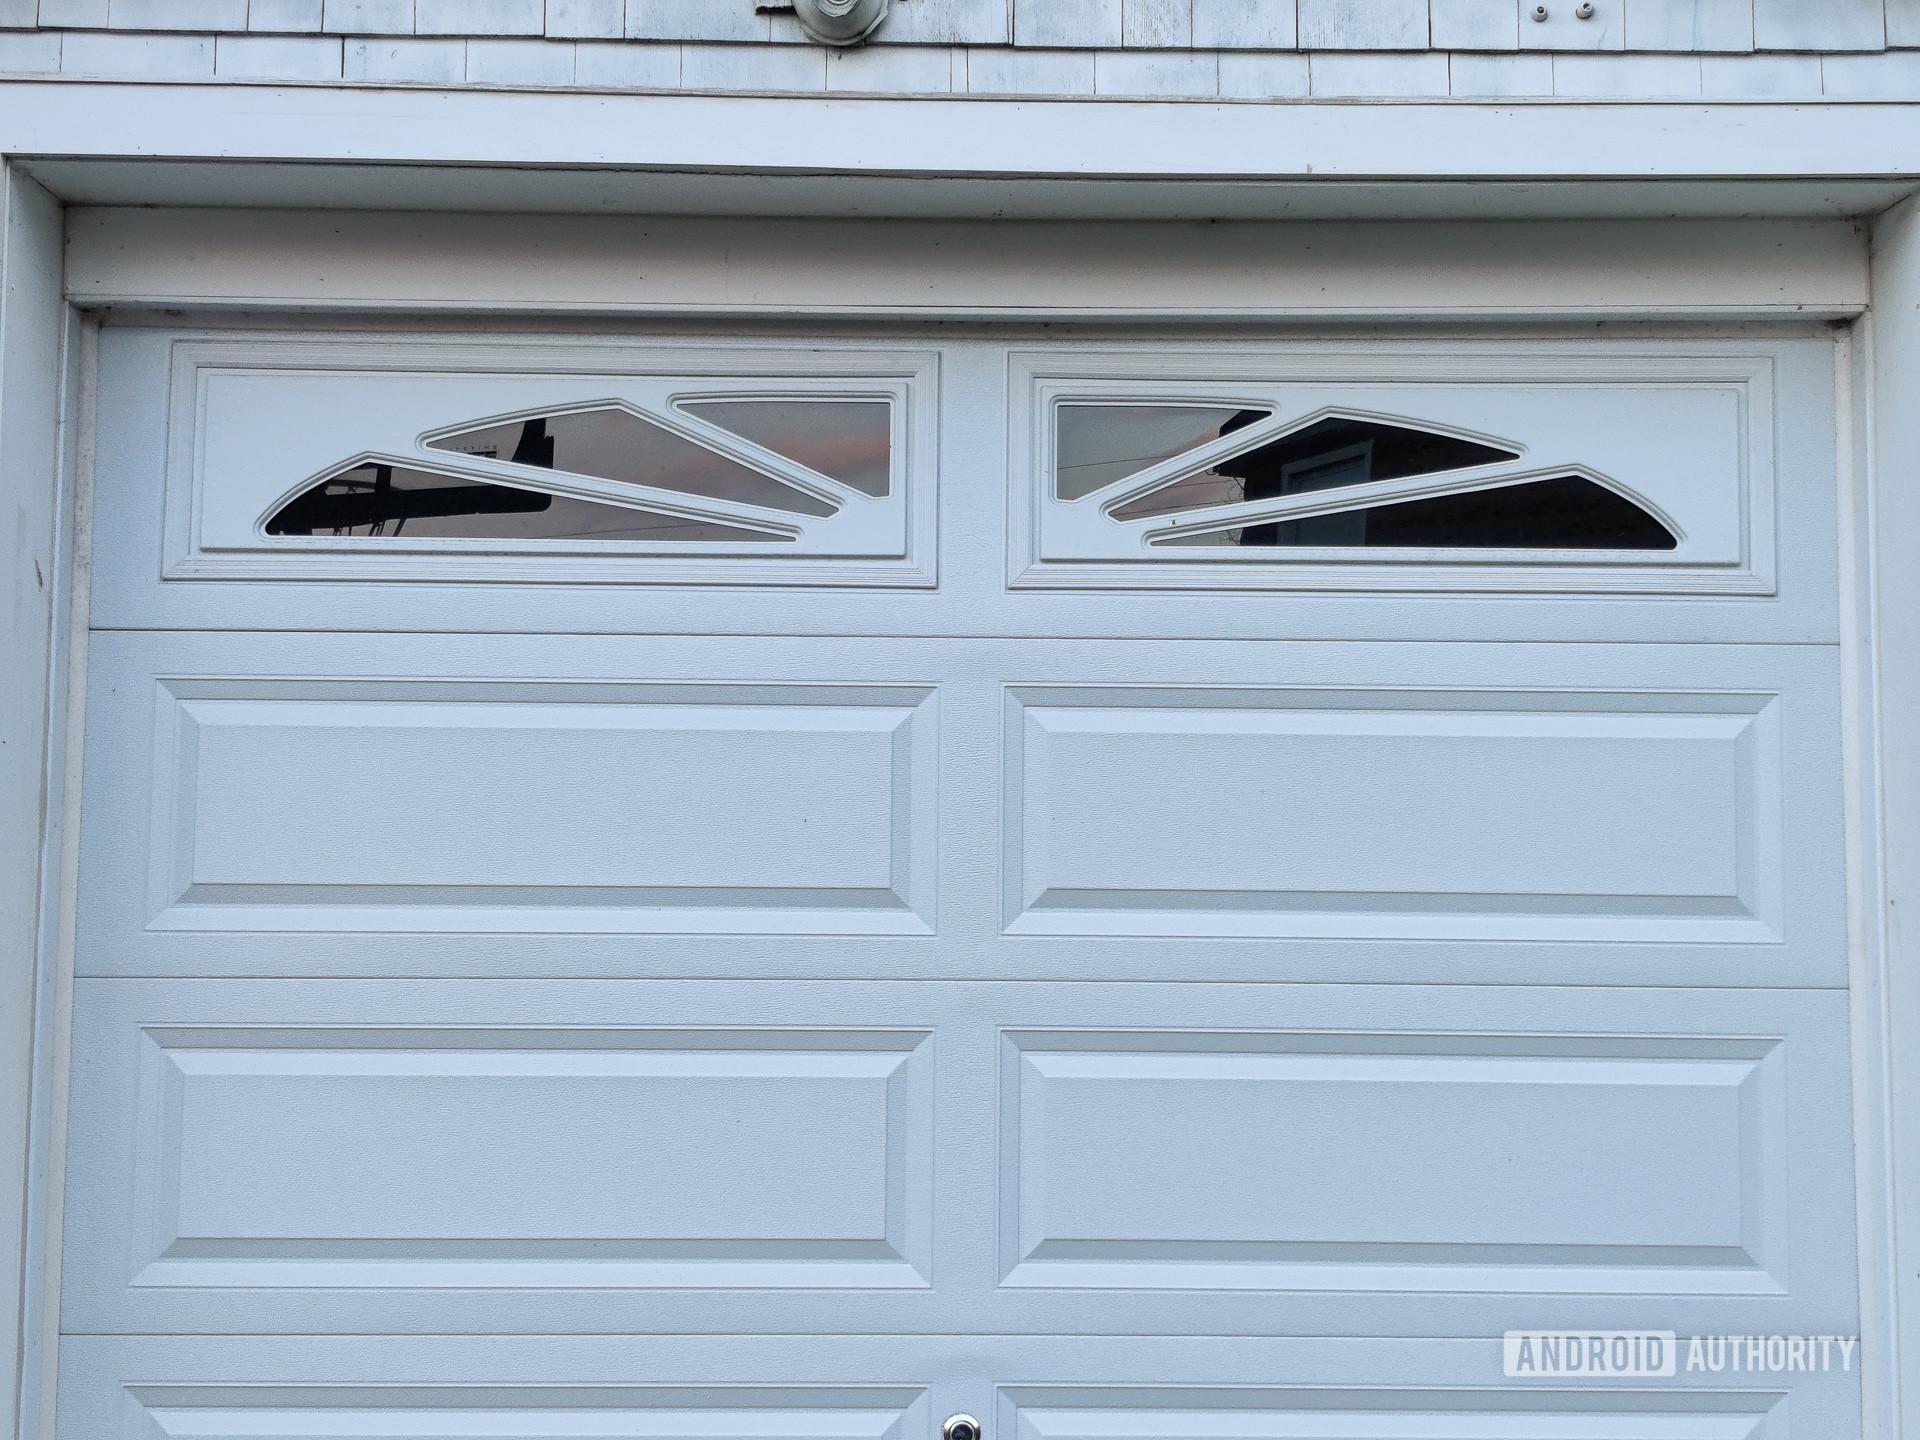 OnePlus 8 photo sample 2x garage